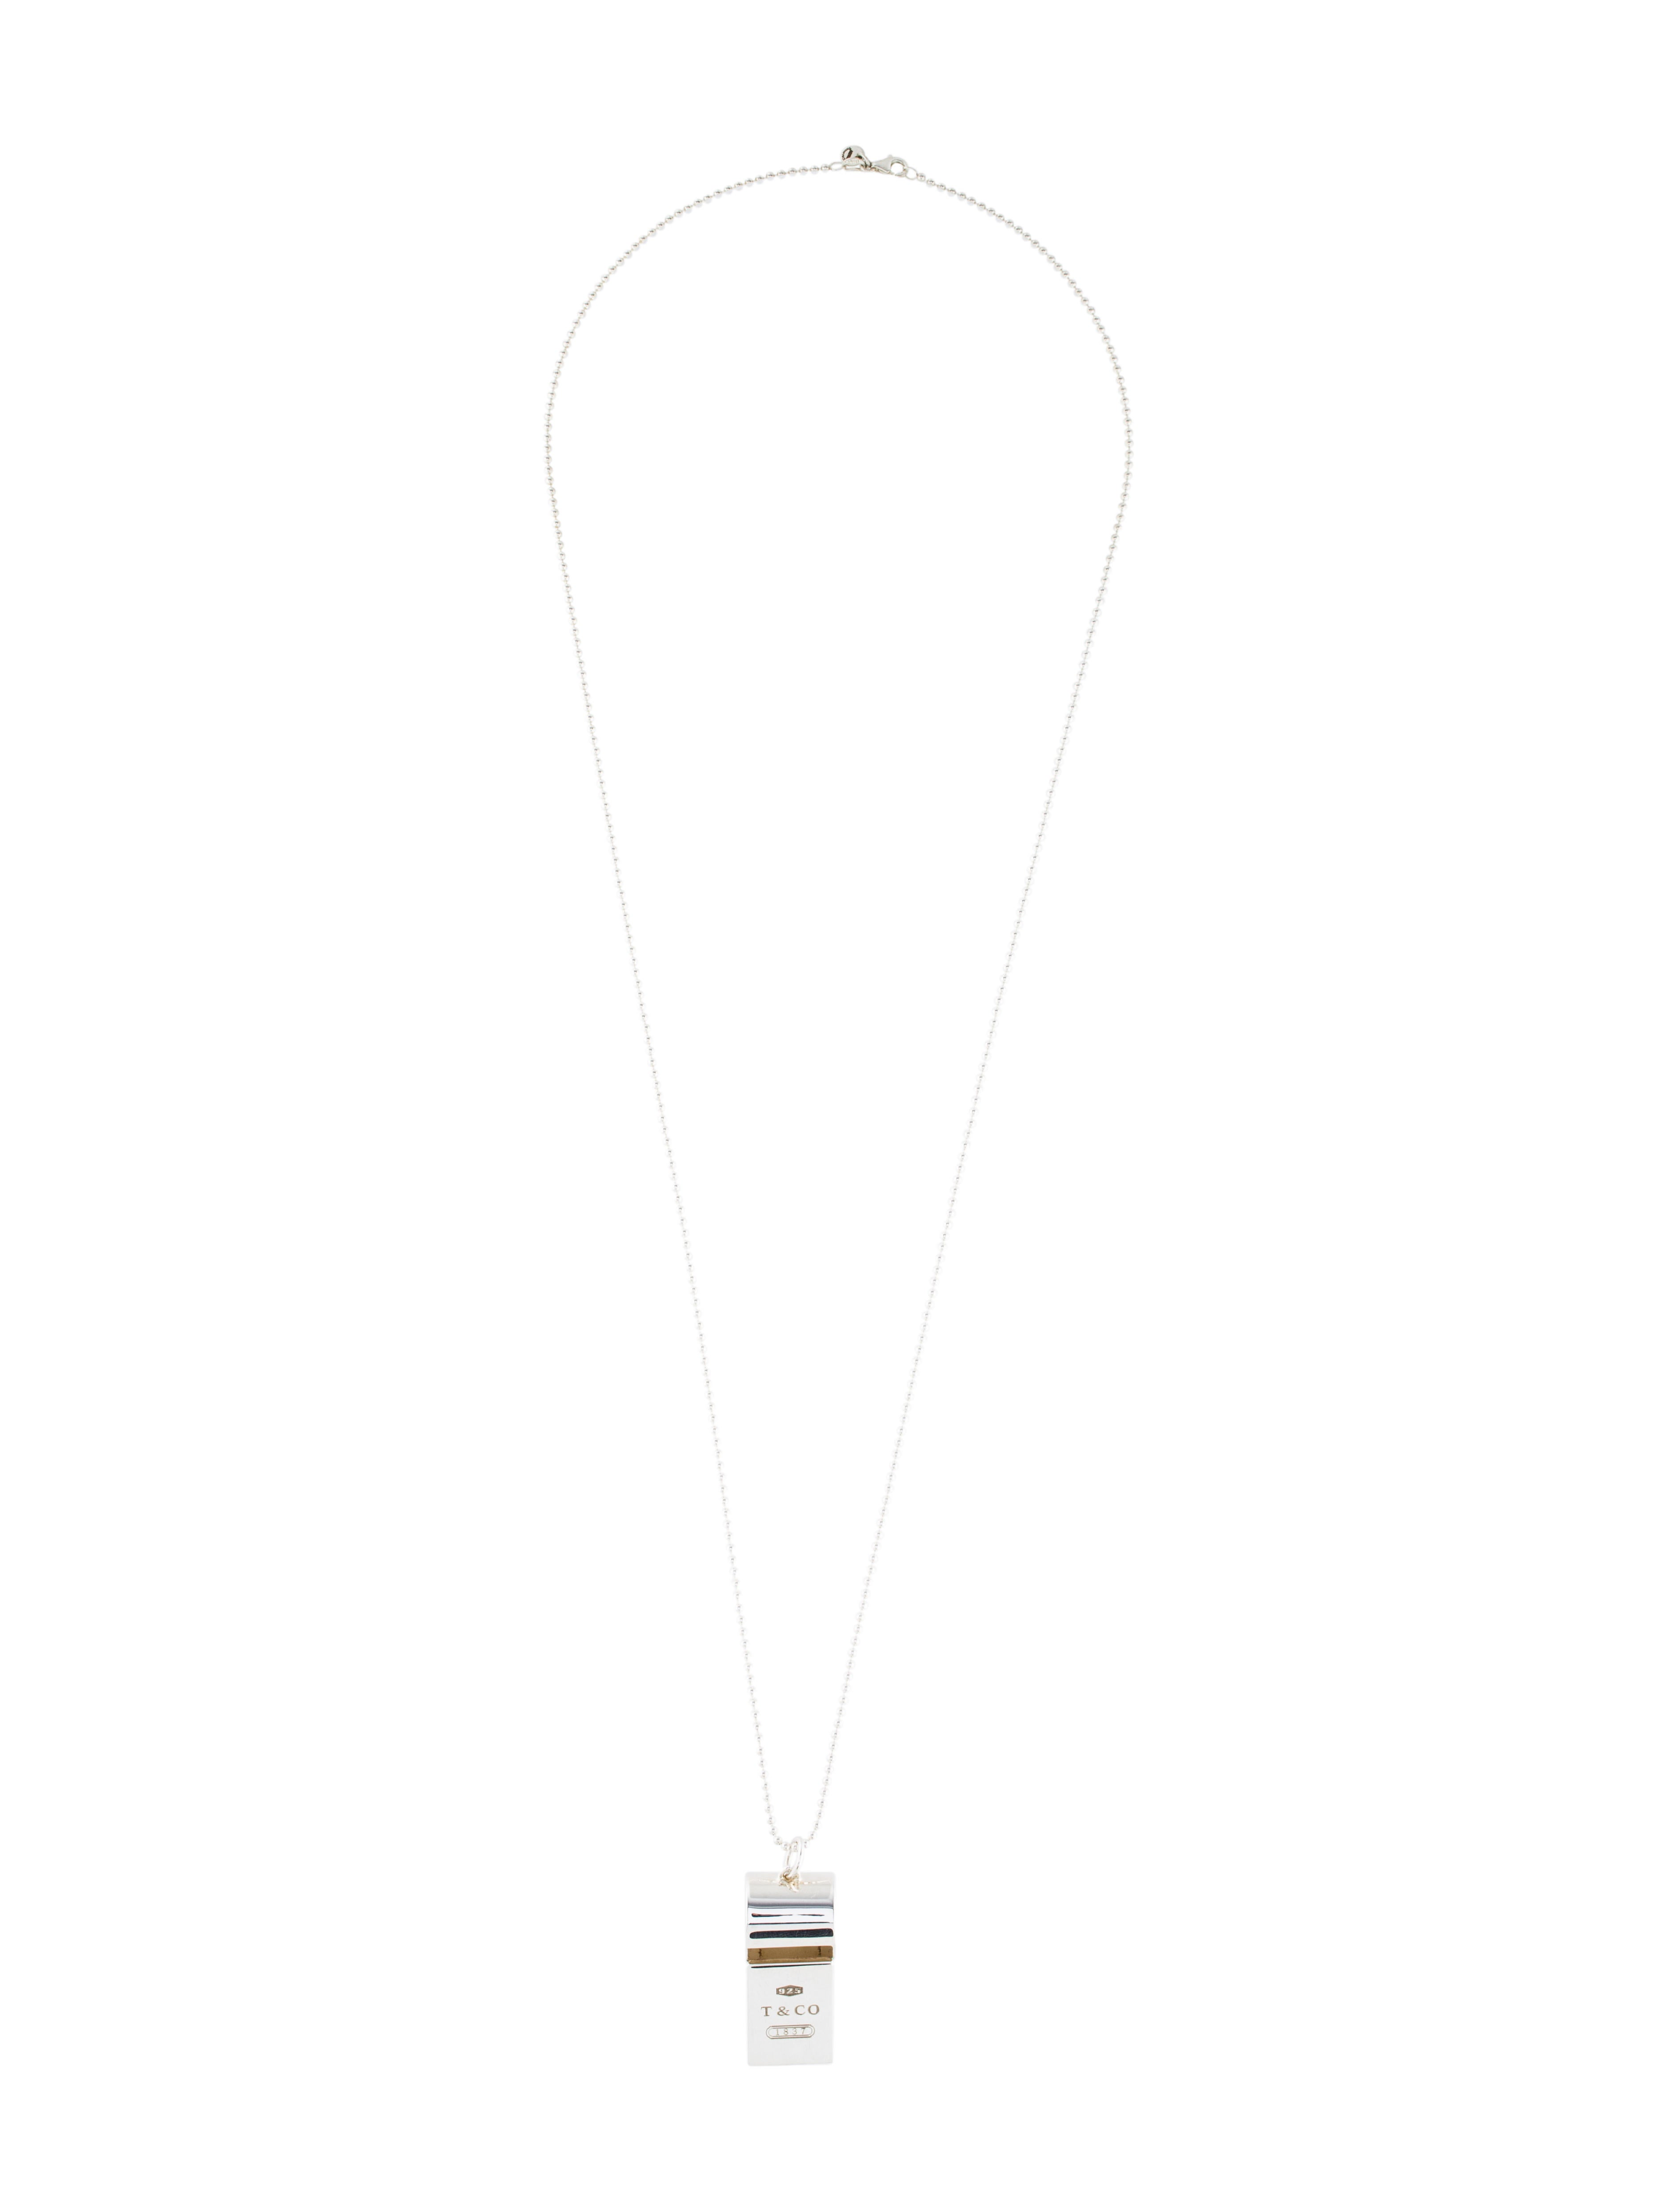 b8b11cb49a79 Tiffany   Co. 1837 Whistle Pendant Necklace - Necklaces - TIF77024 ...